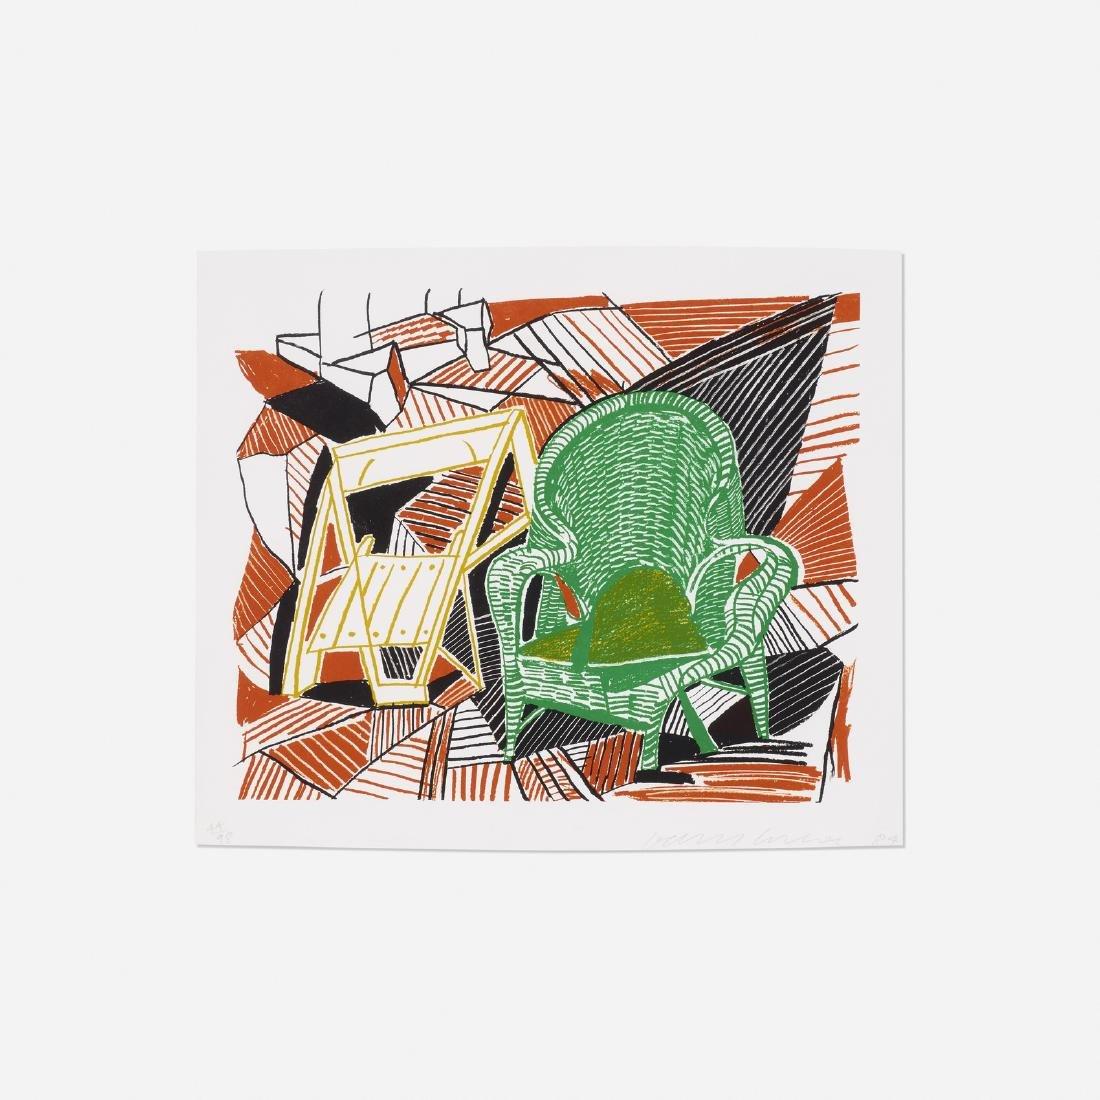 David Hockney, Two Pembroke Studio Chairs, Moving Focus